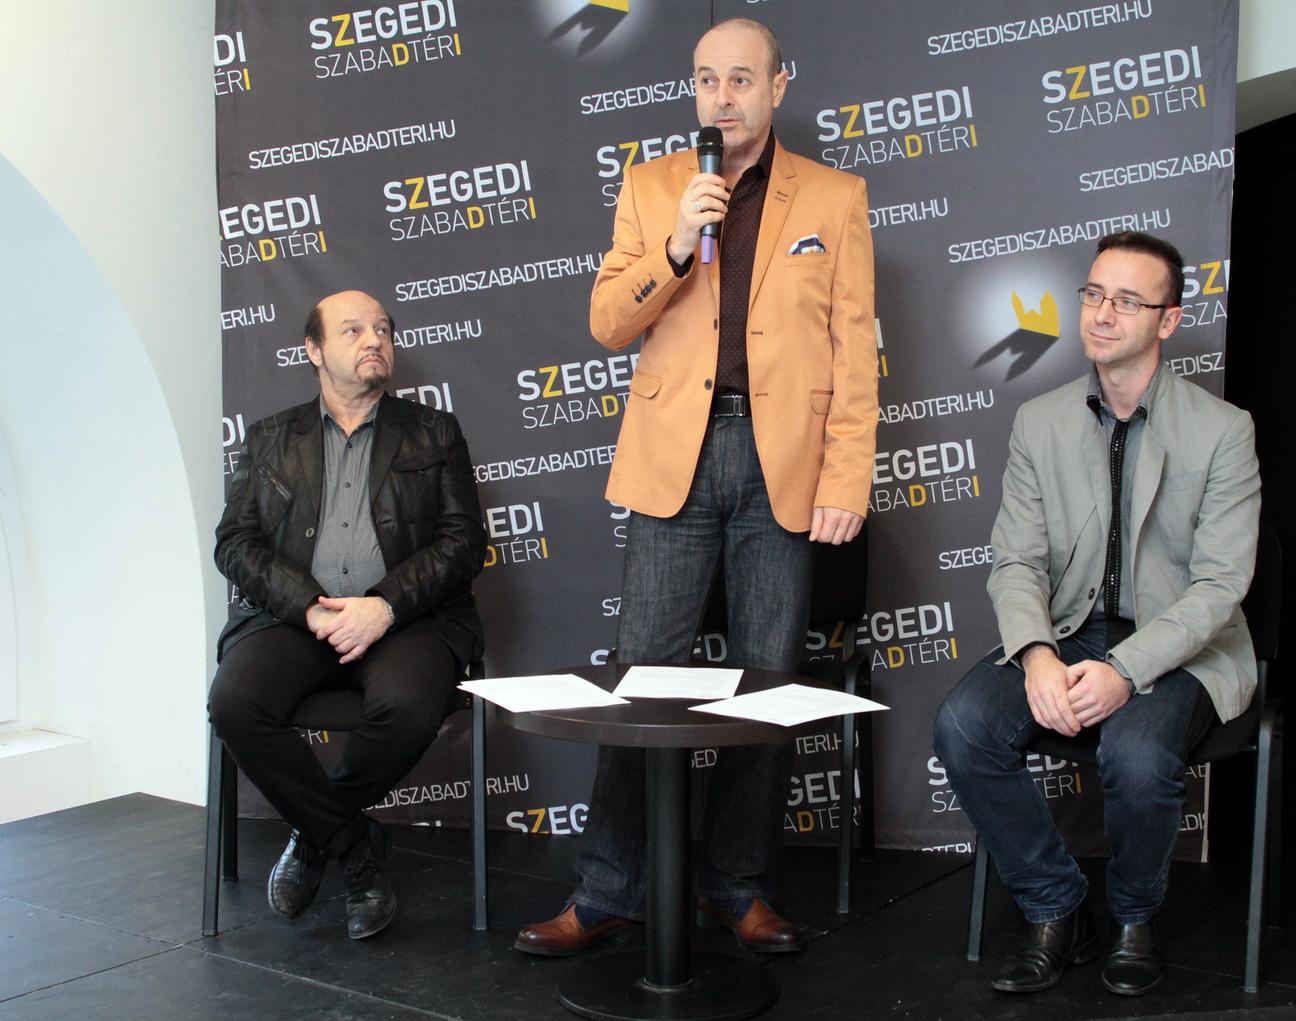 20140204 OPERETT Szegedi sajttaj 16 resize